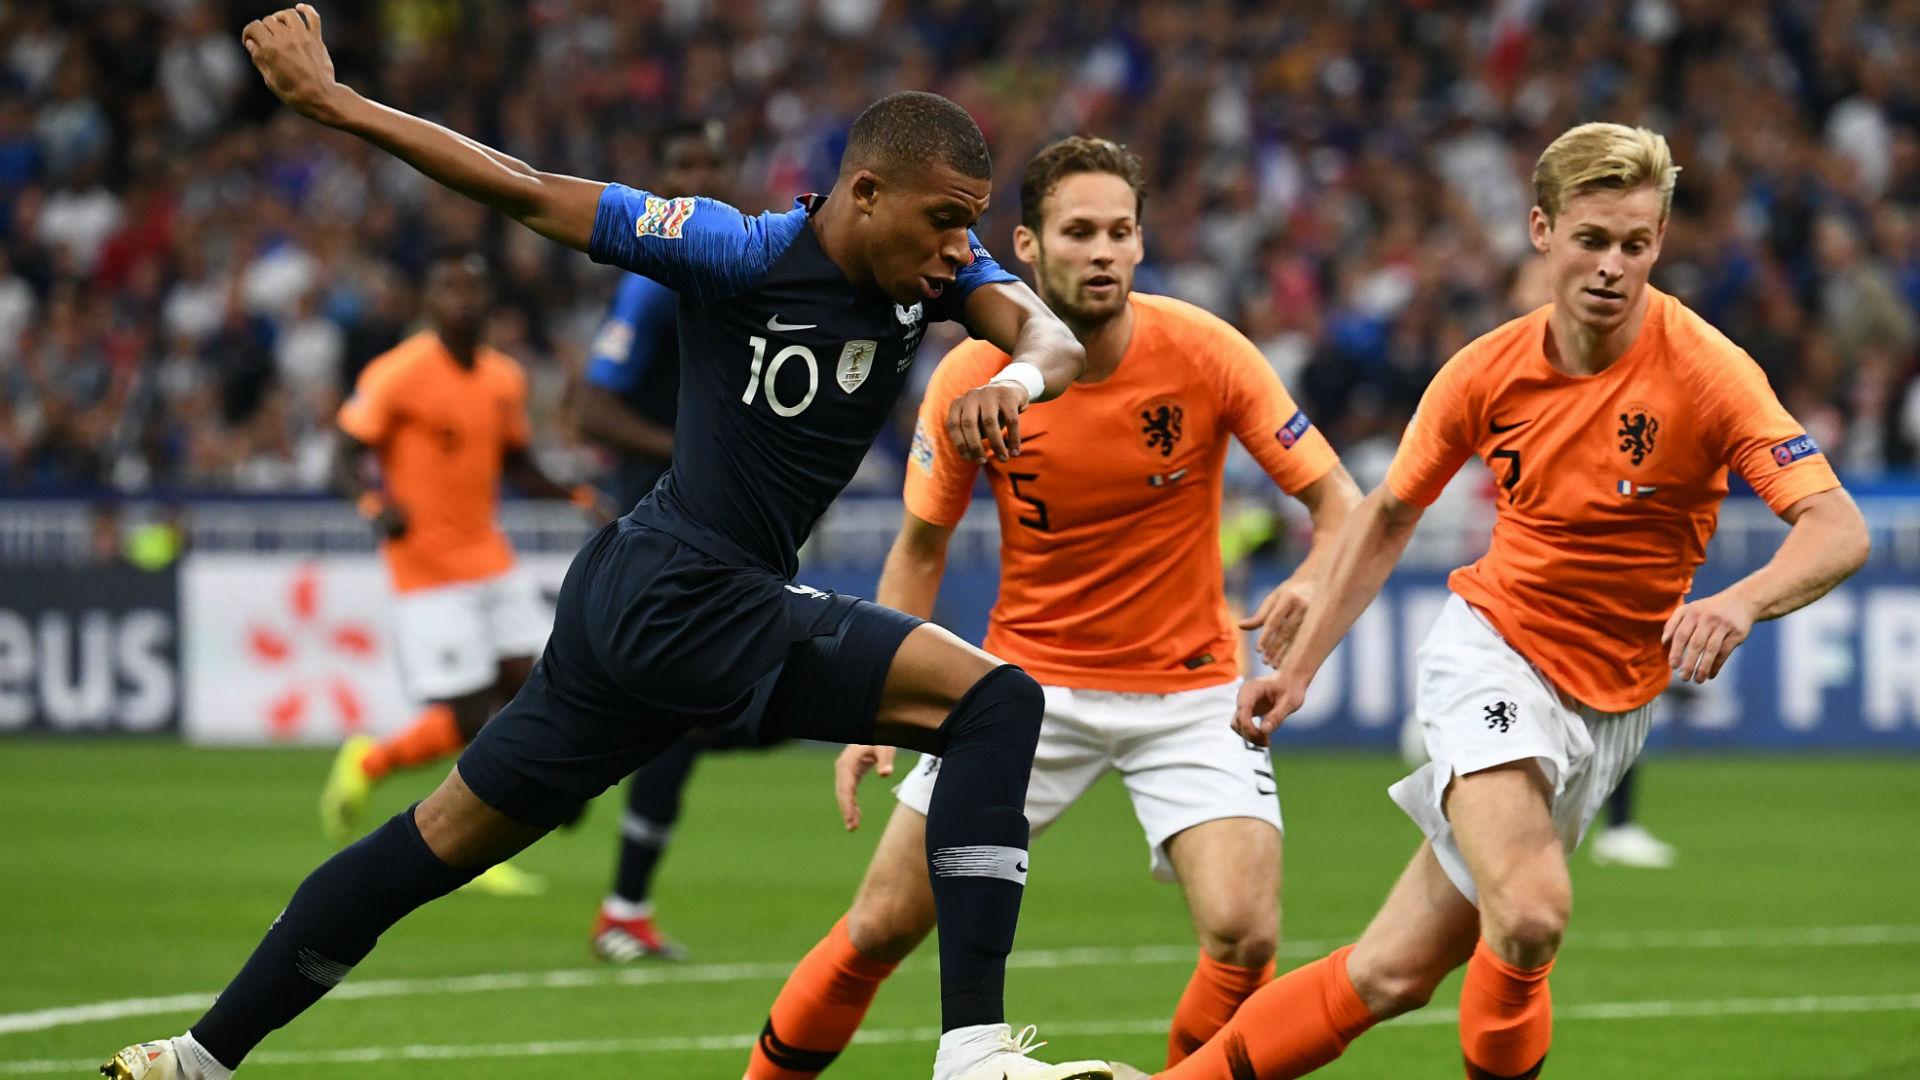 Kylian Mbappe Frenckie De Jong France Netherlands Nations League 09092018